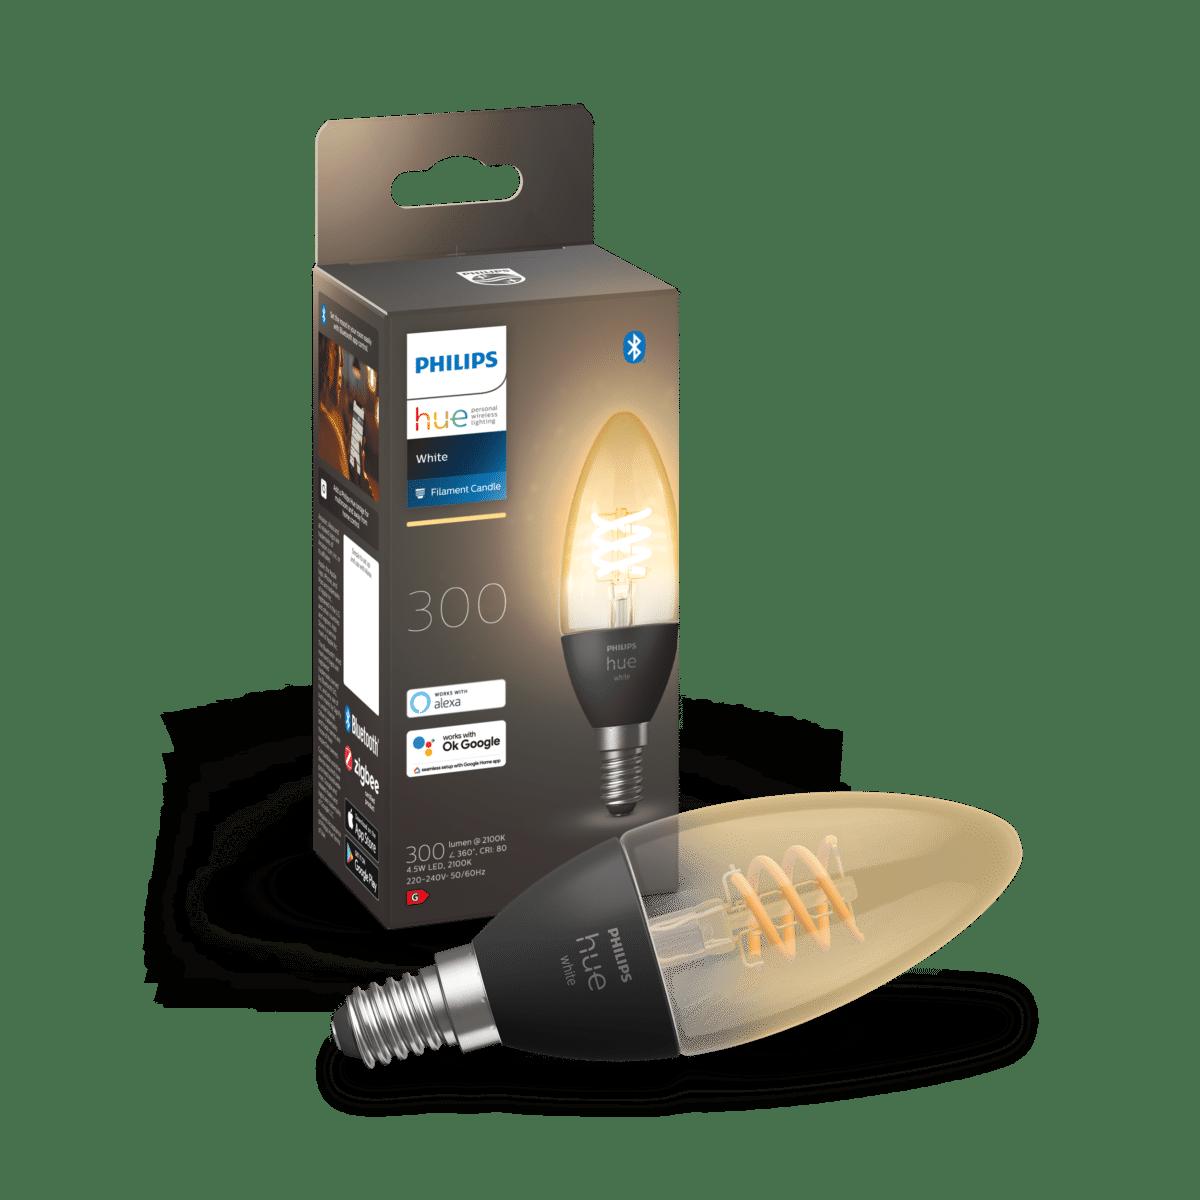 Philips Hue White Filament E14 candle bulb product